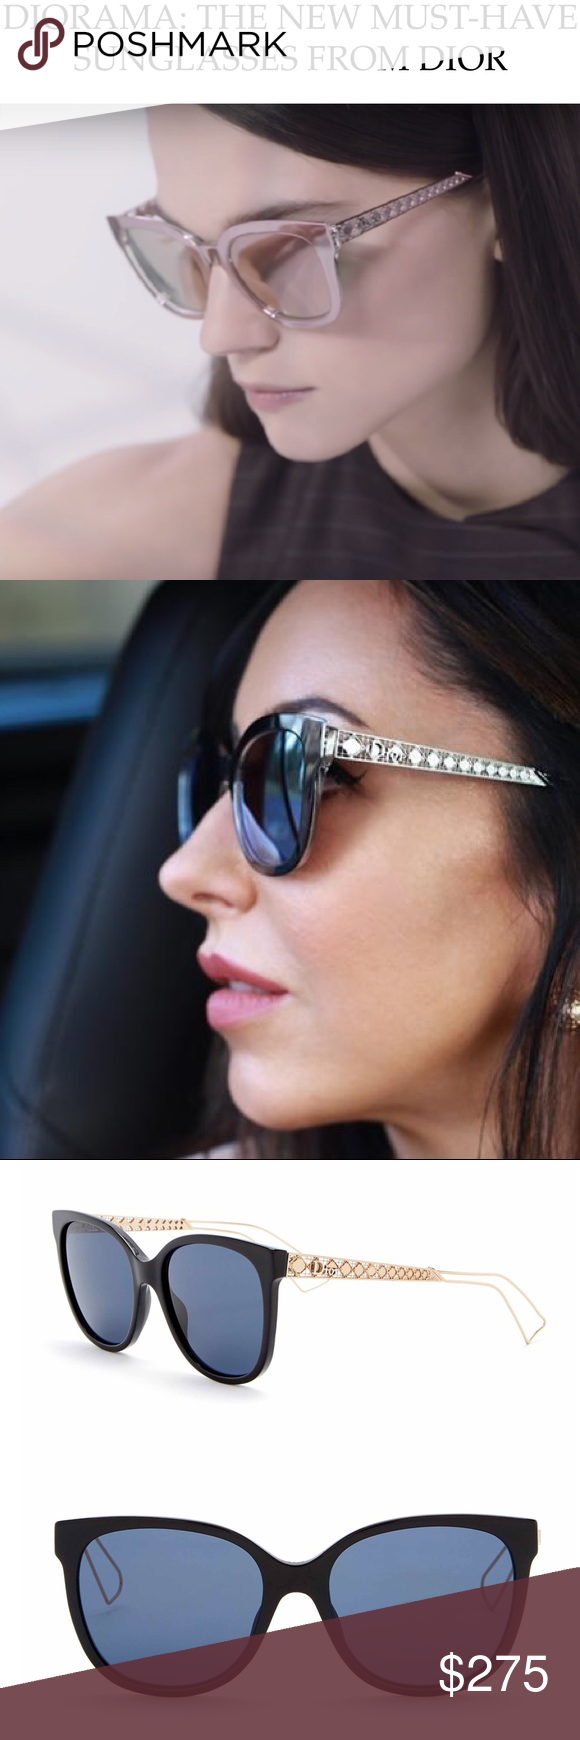 1778948fa6e NIB Christian Dior Diorama 3 Cat Eye Sunglasses Brand New and Sold Out. All  of